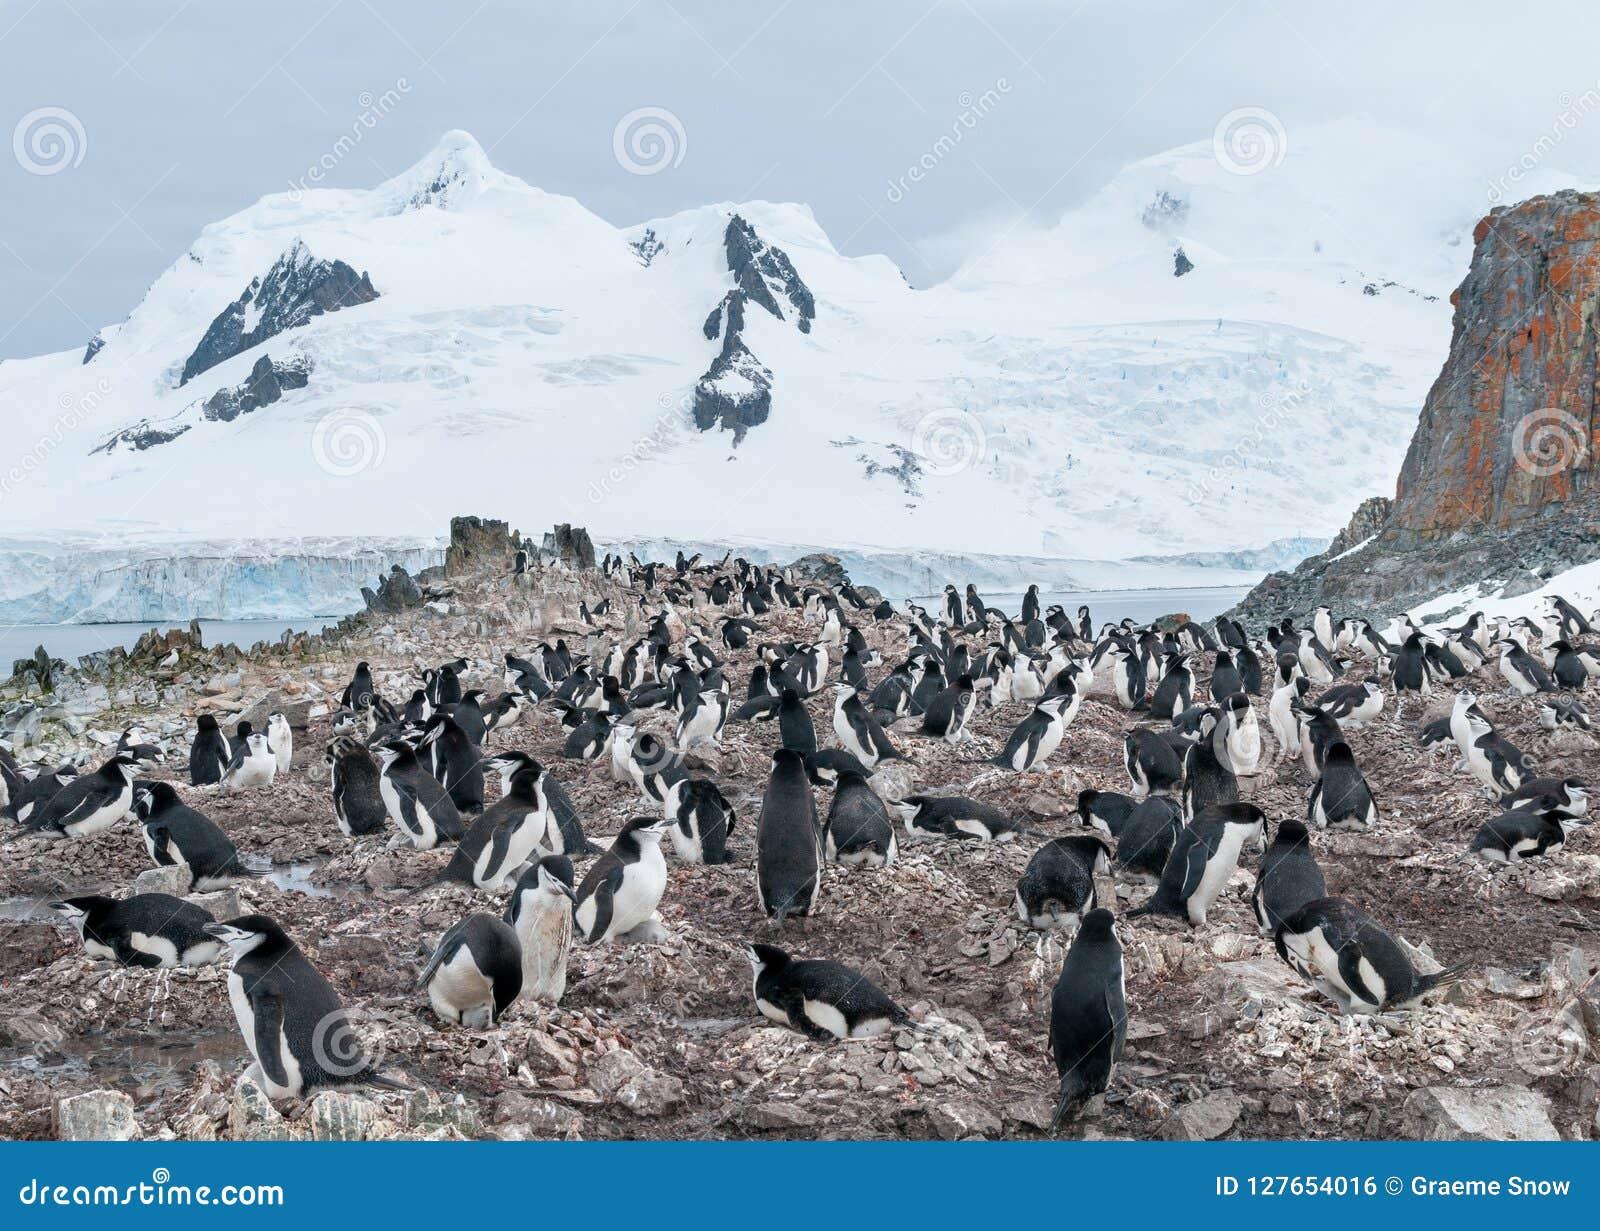 Nesting Chinstrap Penguin colony, Halfmoon Island, Antarctic Peninsula